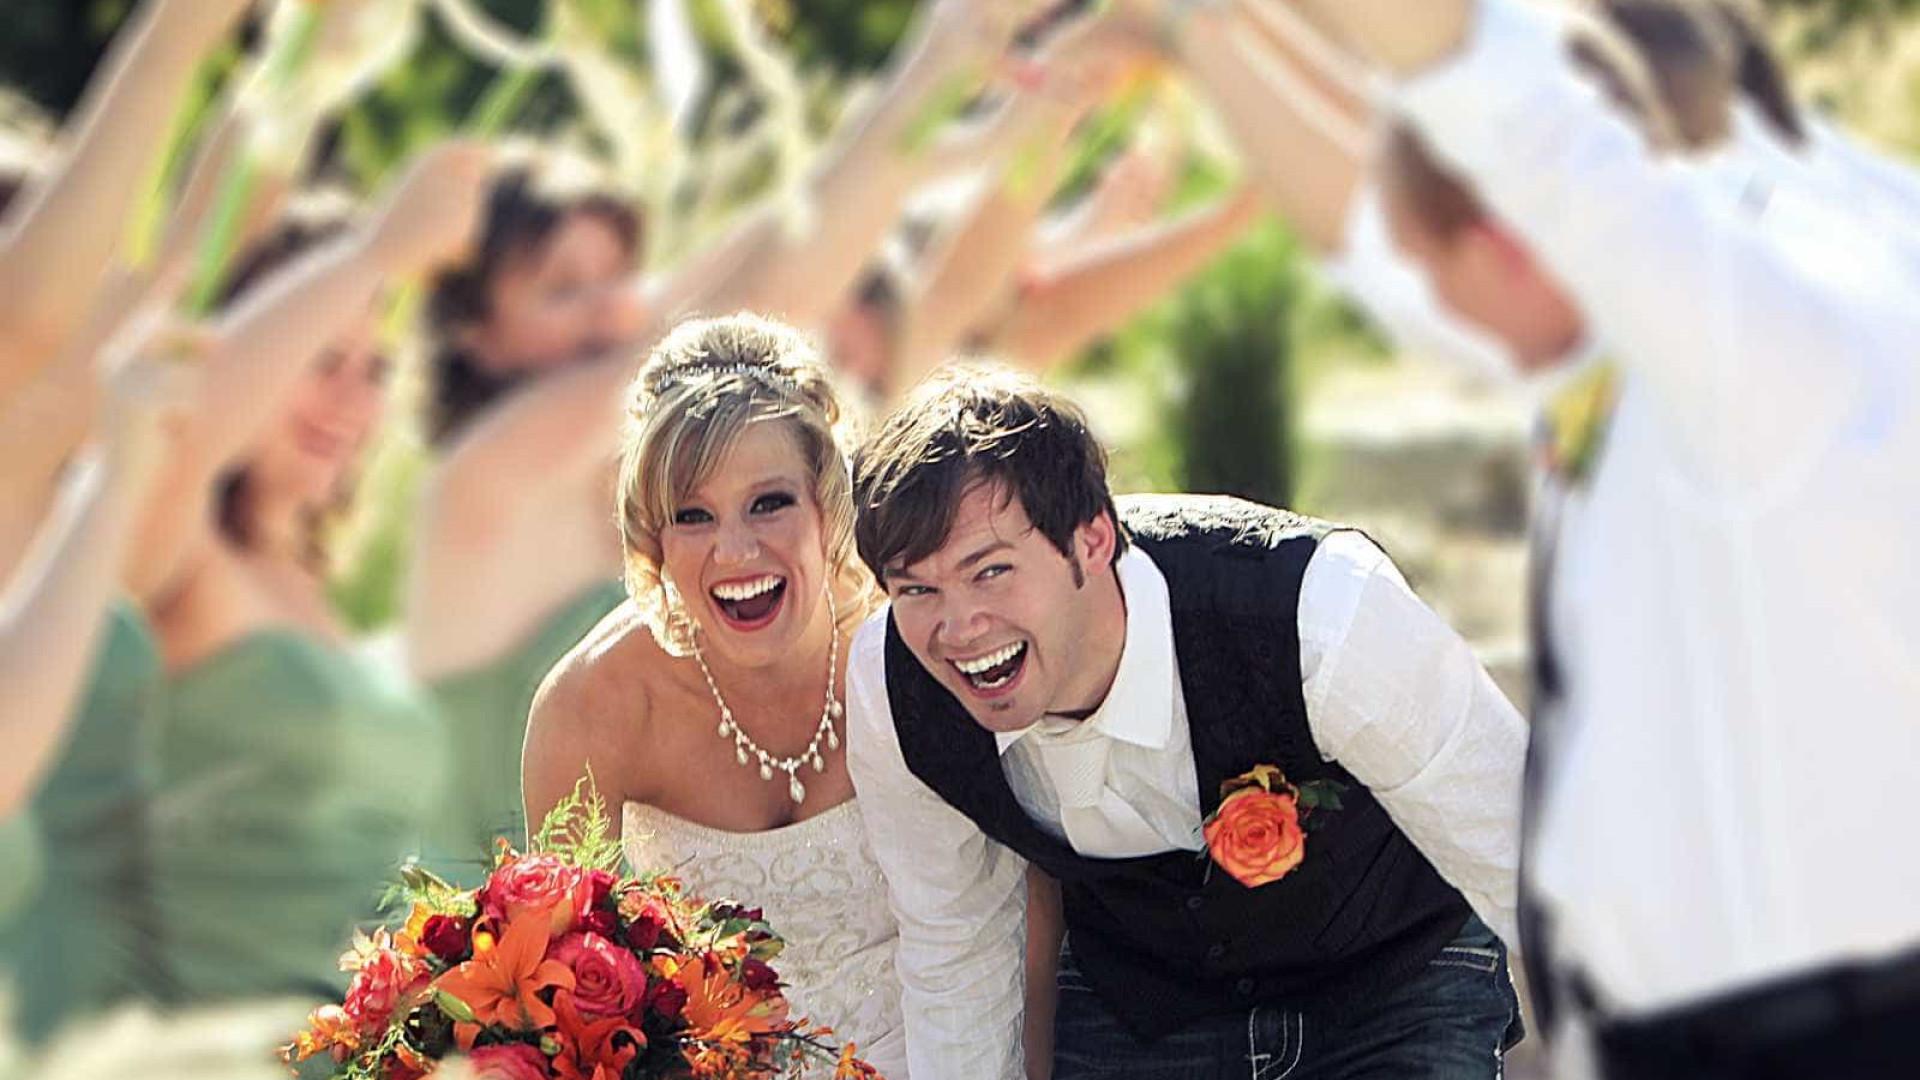 Confira 4 casamentos 'excêntricos' organizados na Itália